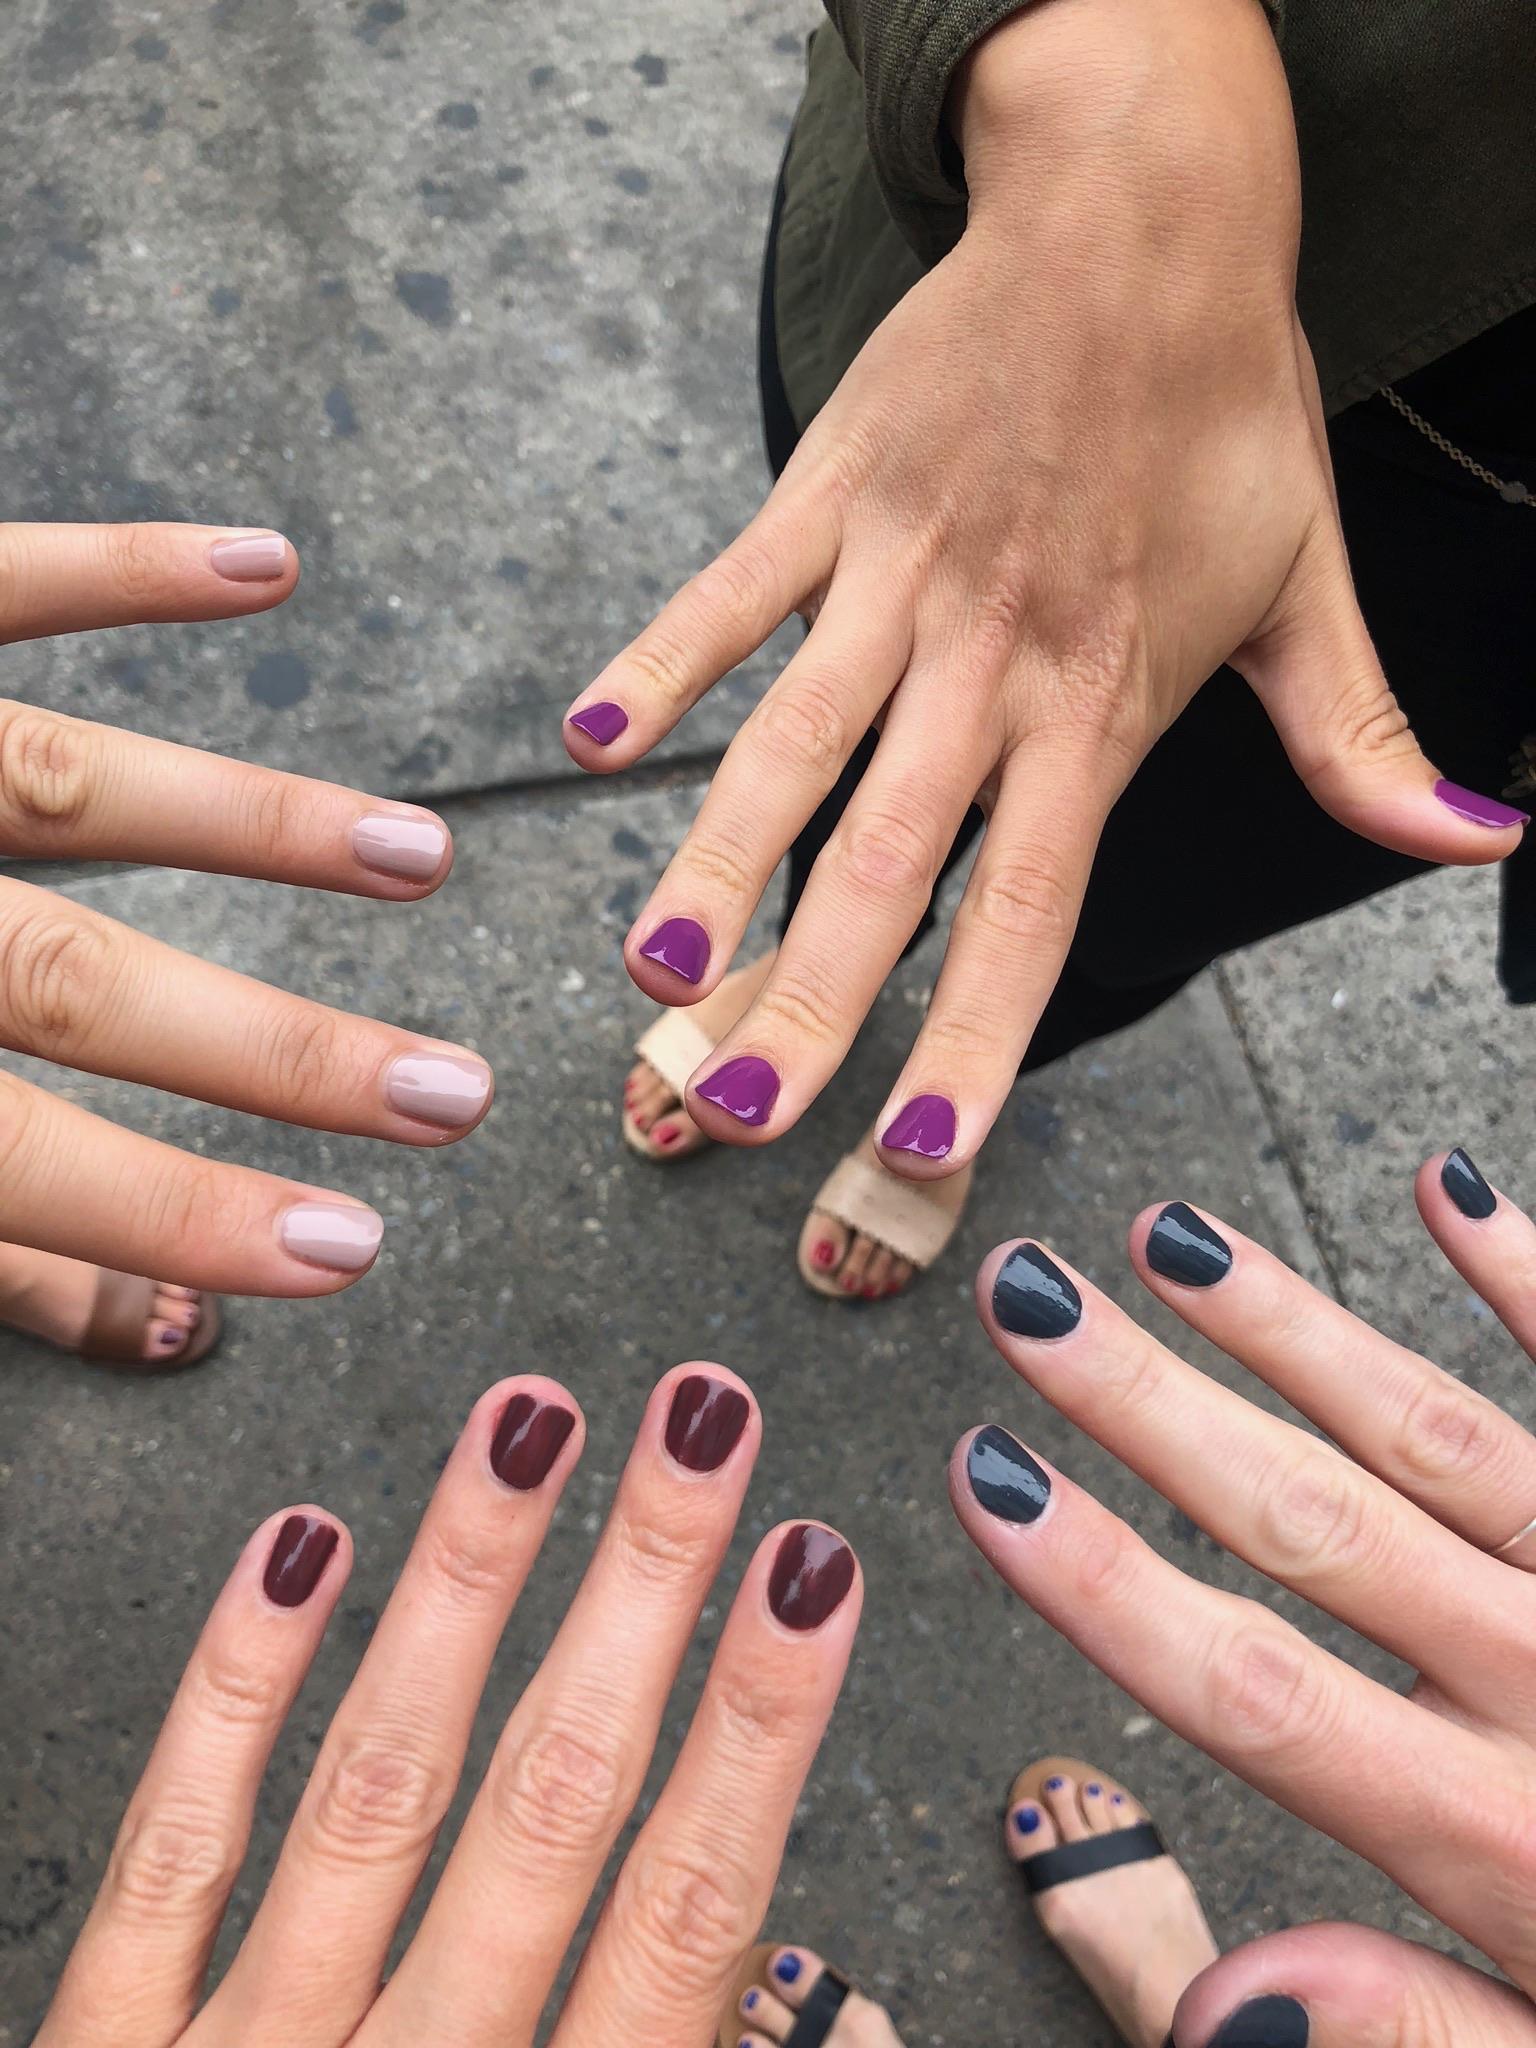 After brunch, we got our nails done!